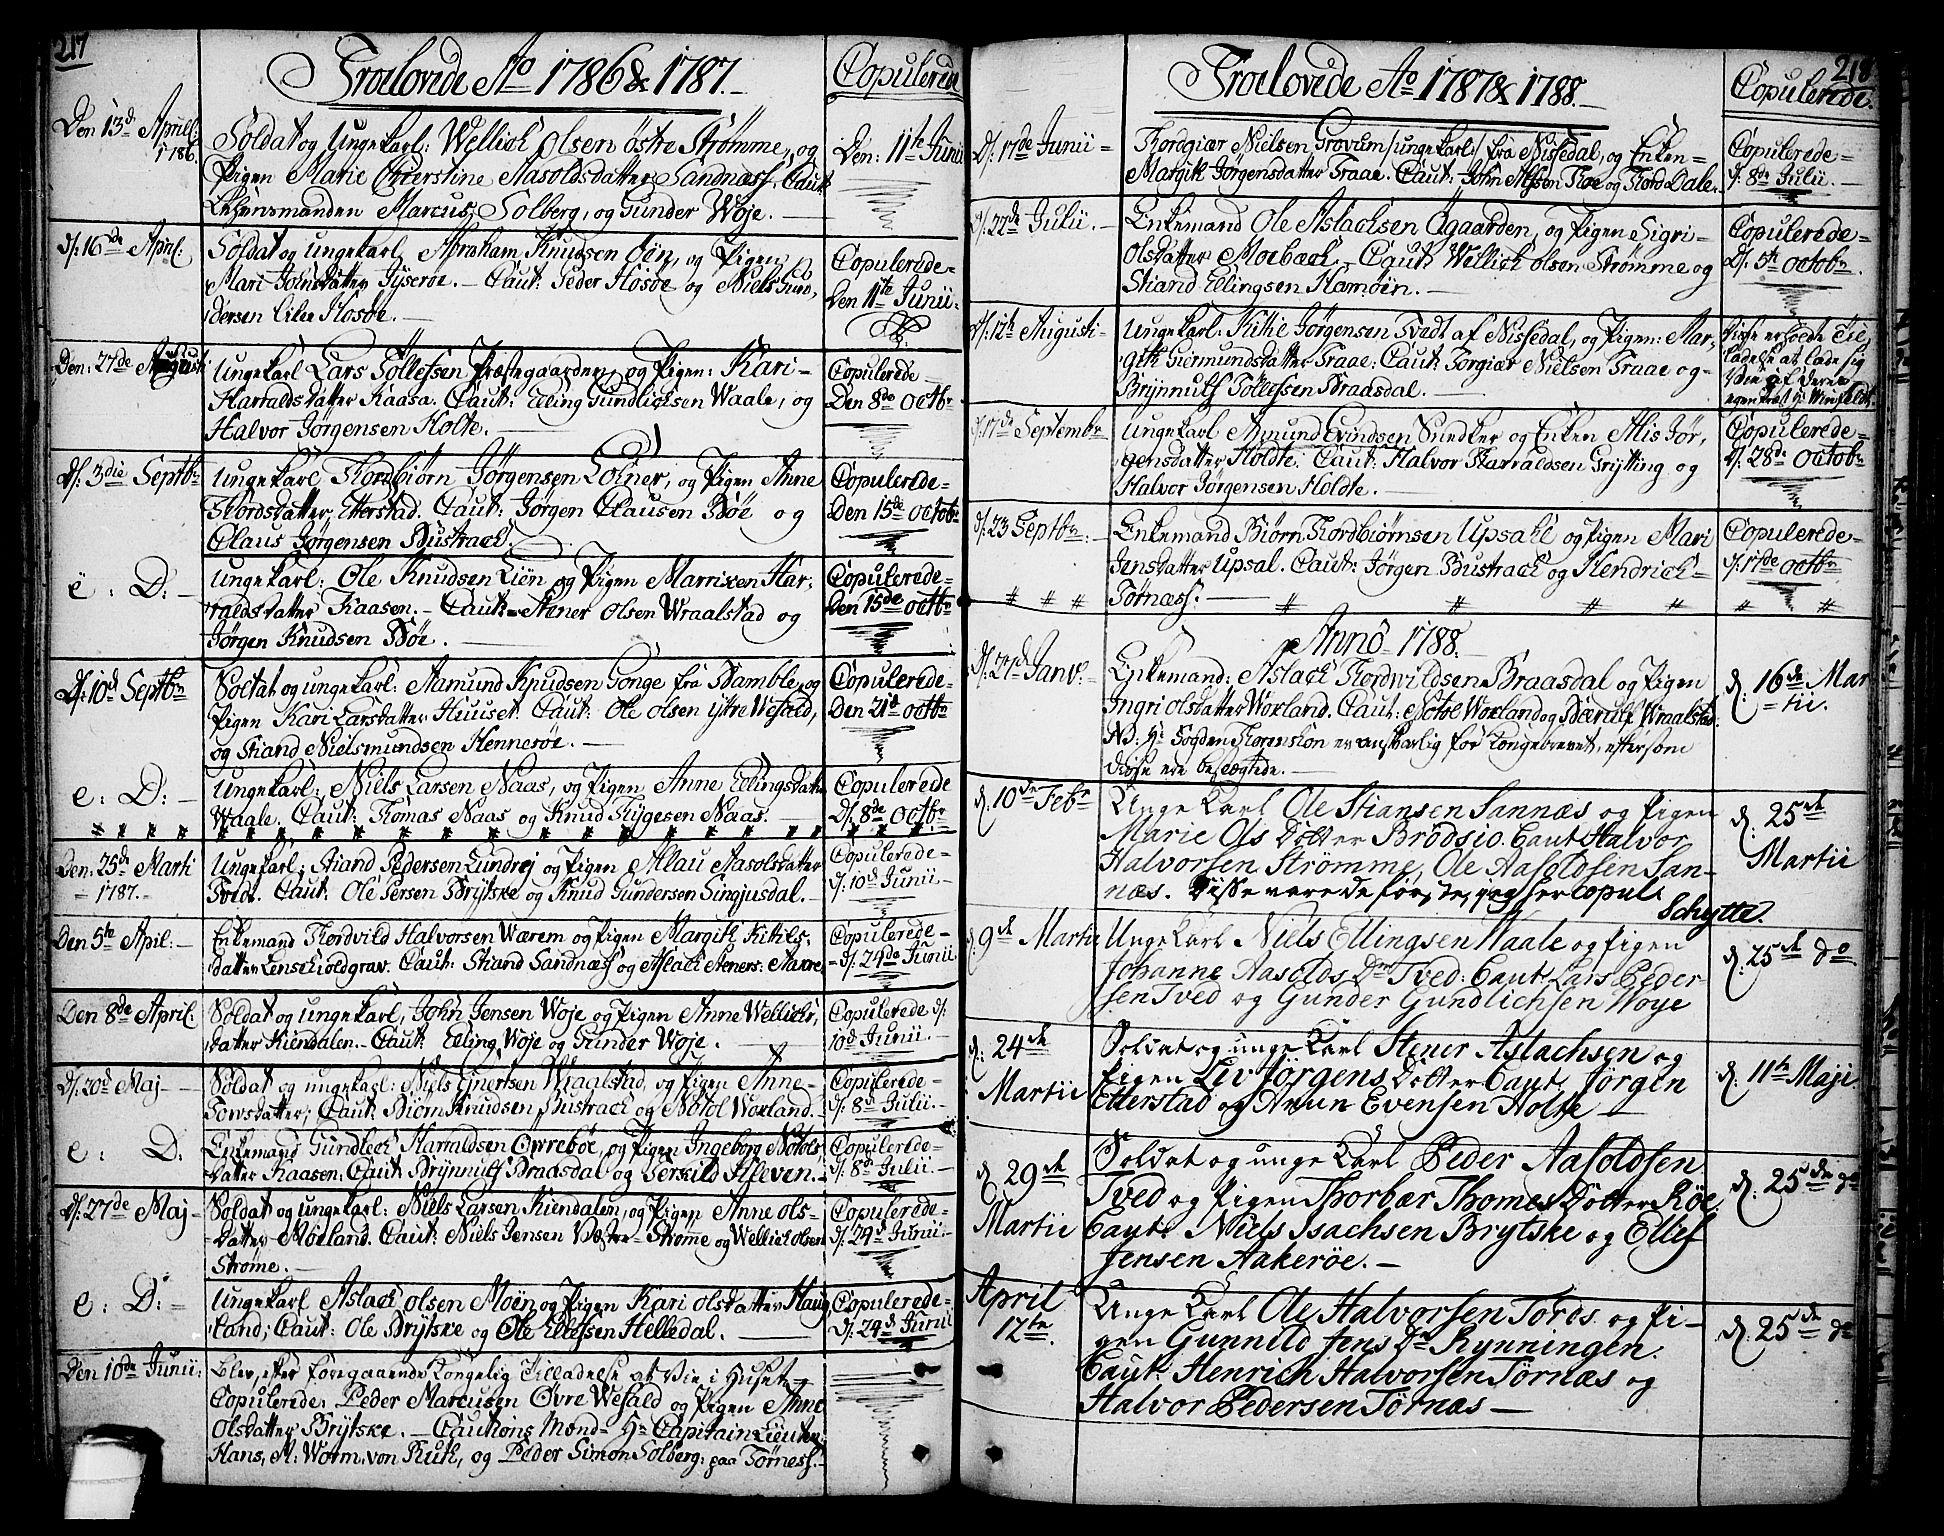 SAKO, Drangedal kirkebøker, F/Fa/L0003: Ministerialbok nr. 3, 1768-1814, s. 217-218